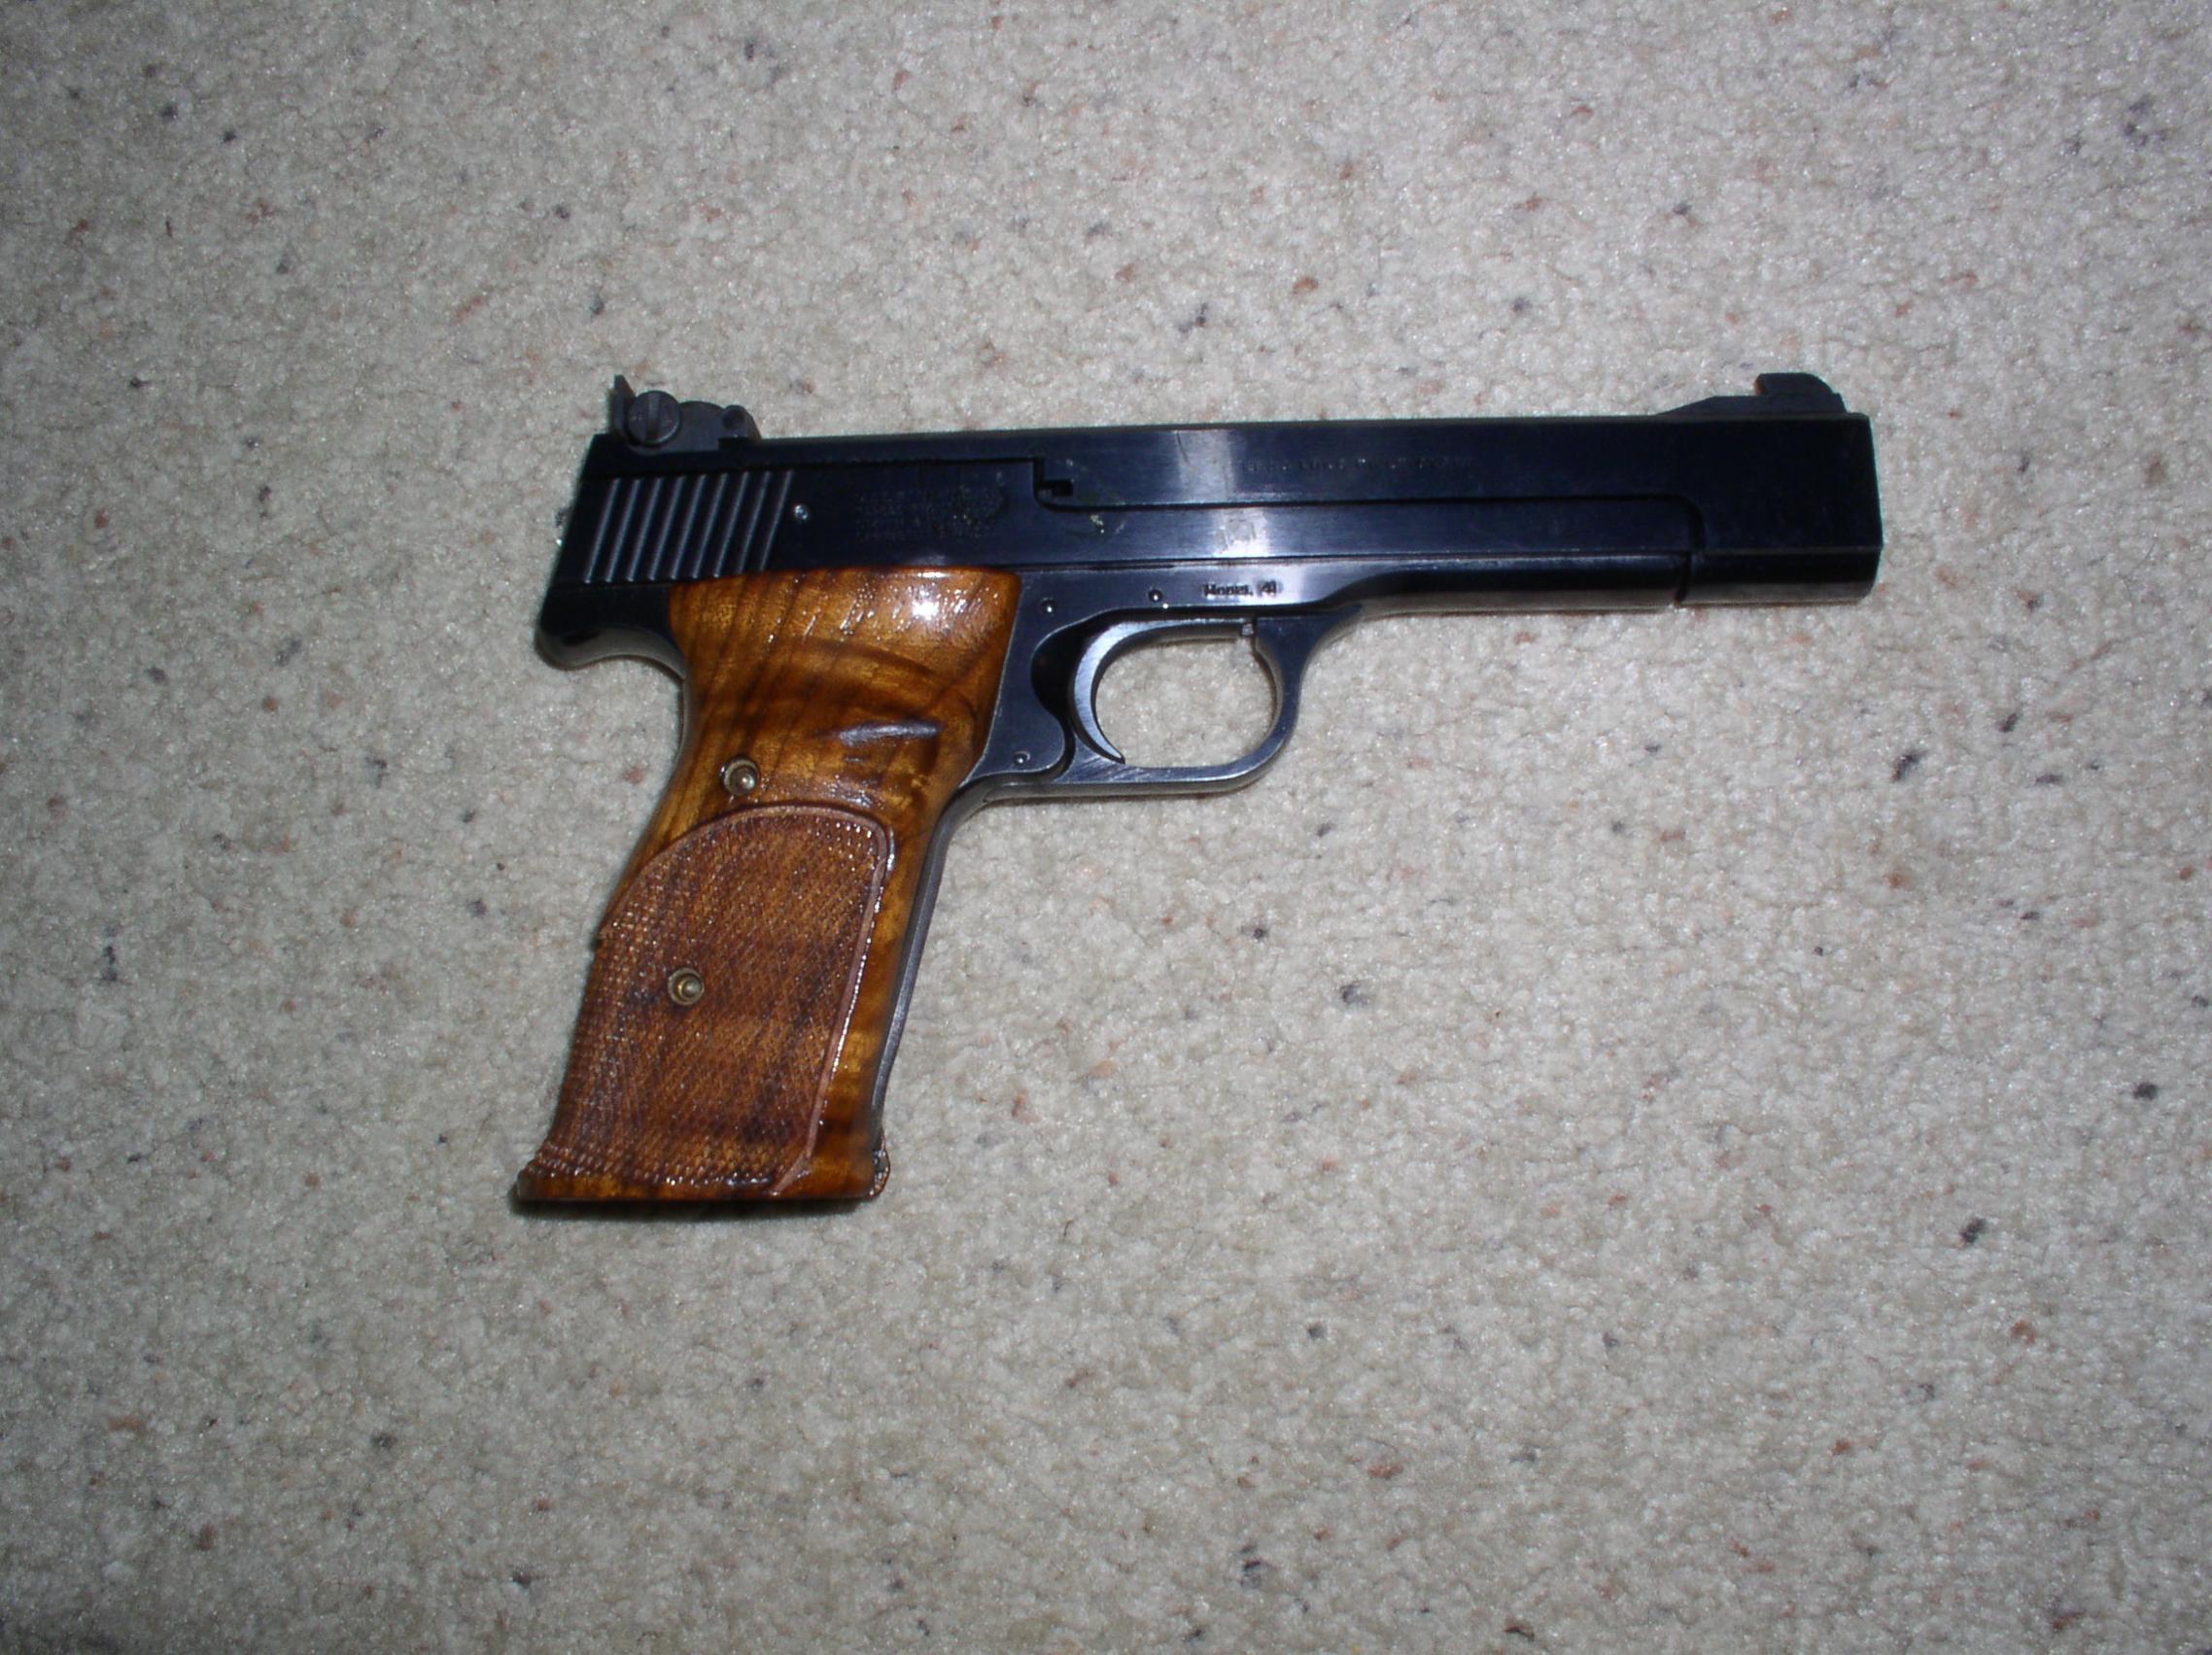 New old target pistol-p1010198.jpg